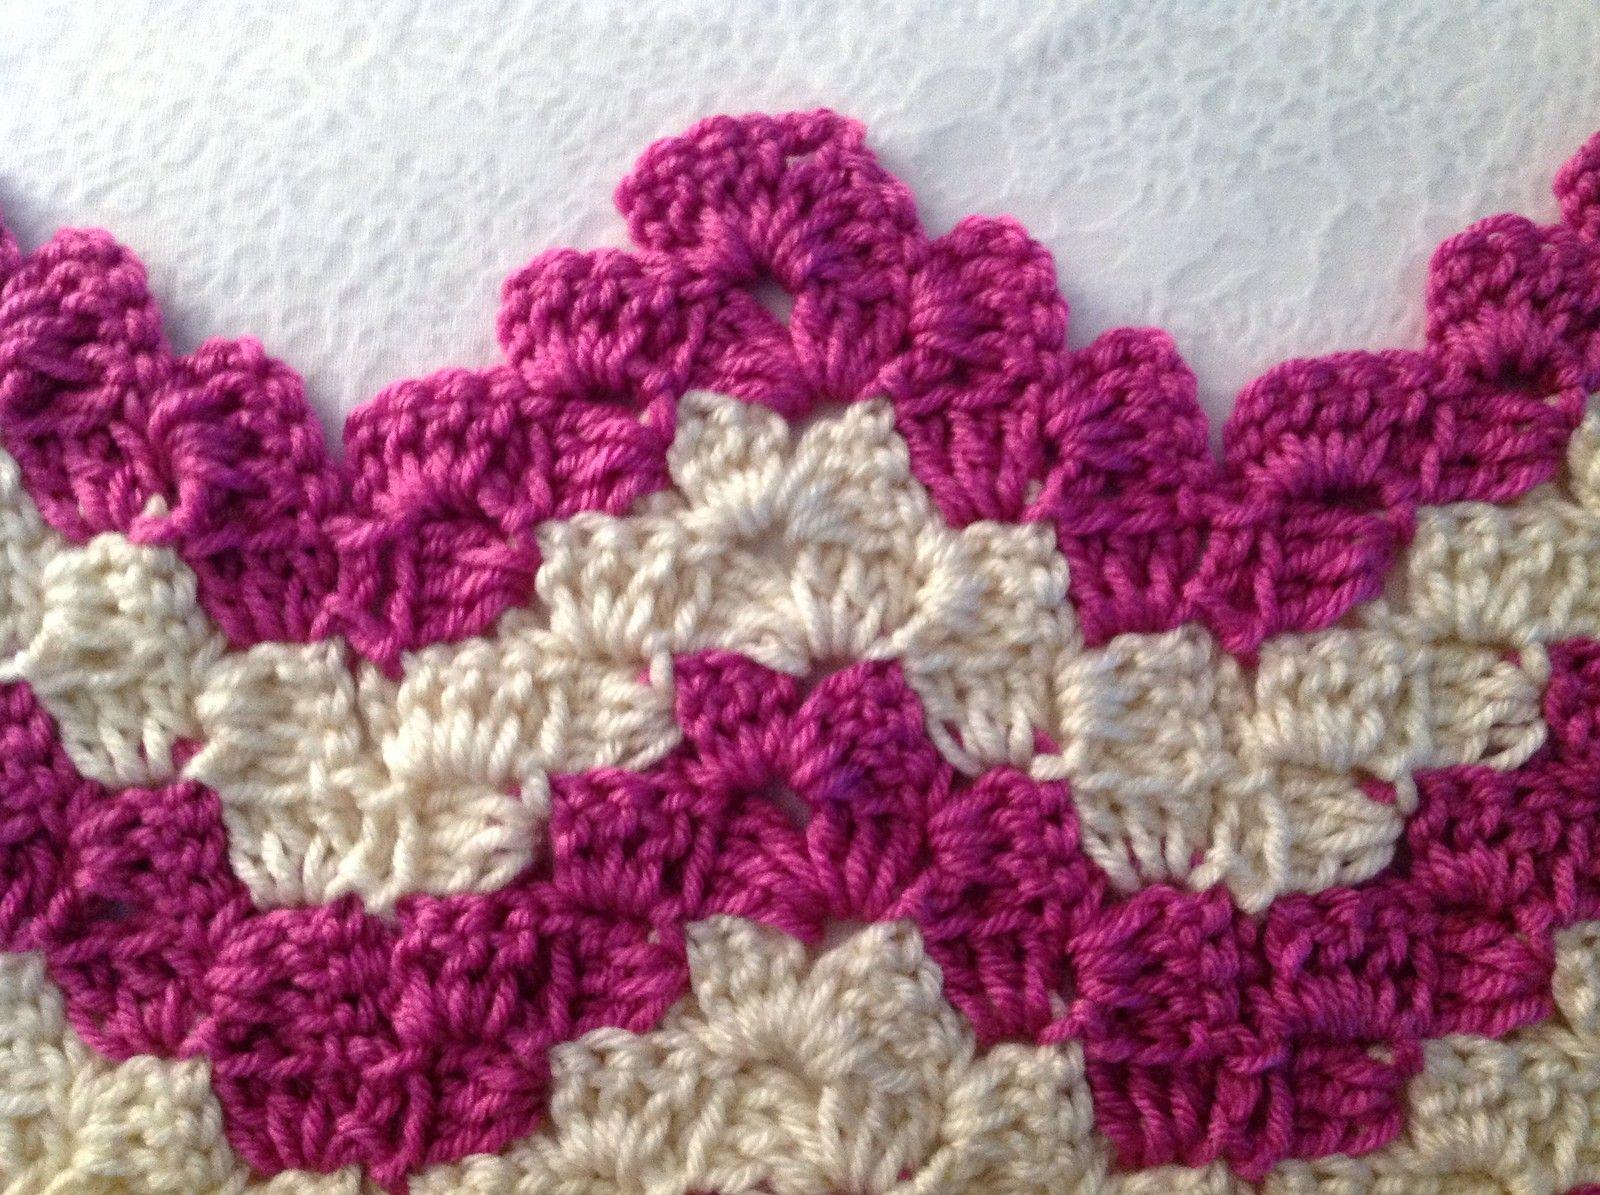 Learn A New Crochet Stitch: Vintage Rippling Blocks | Pinterest ...